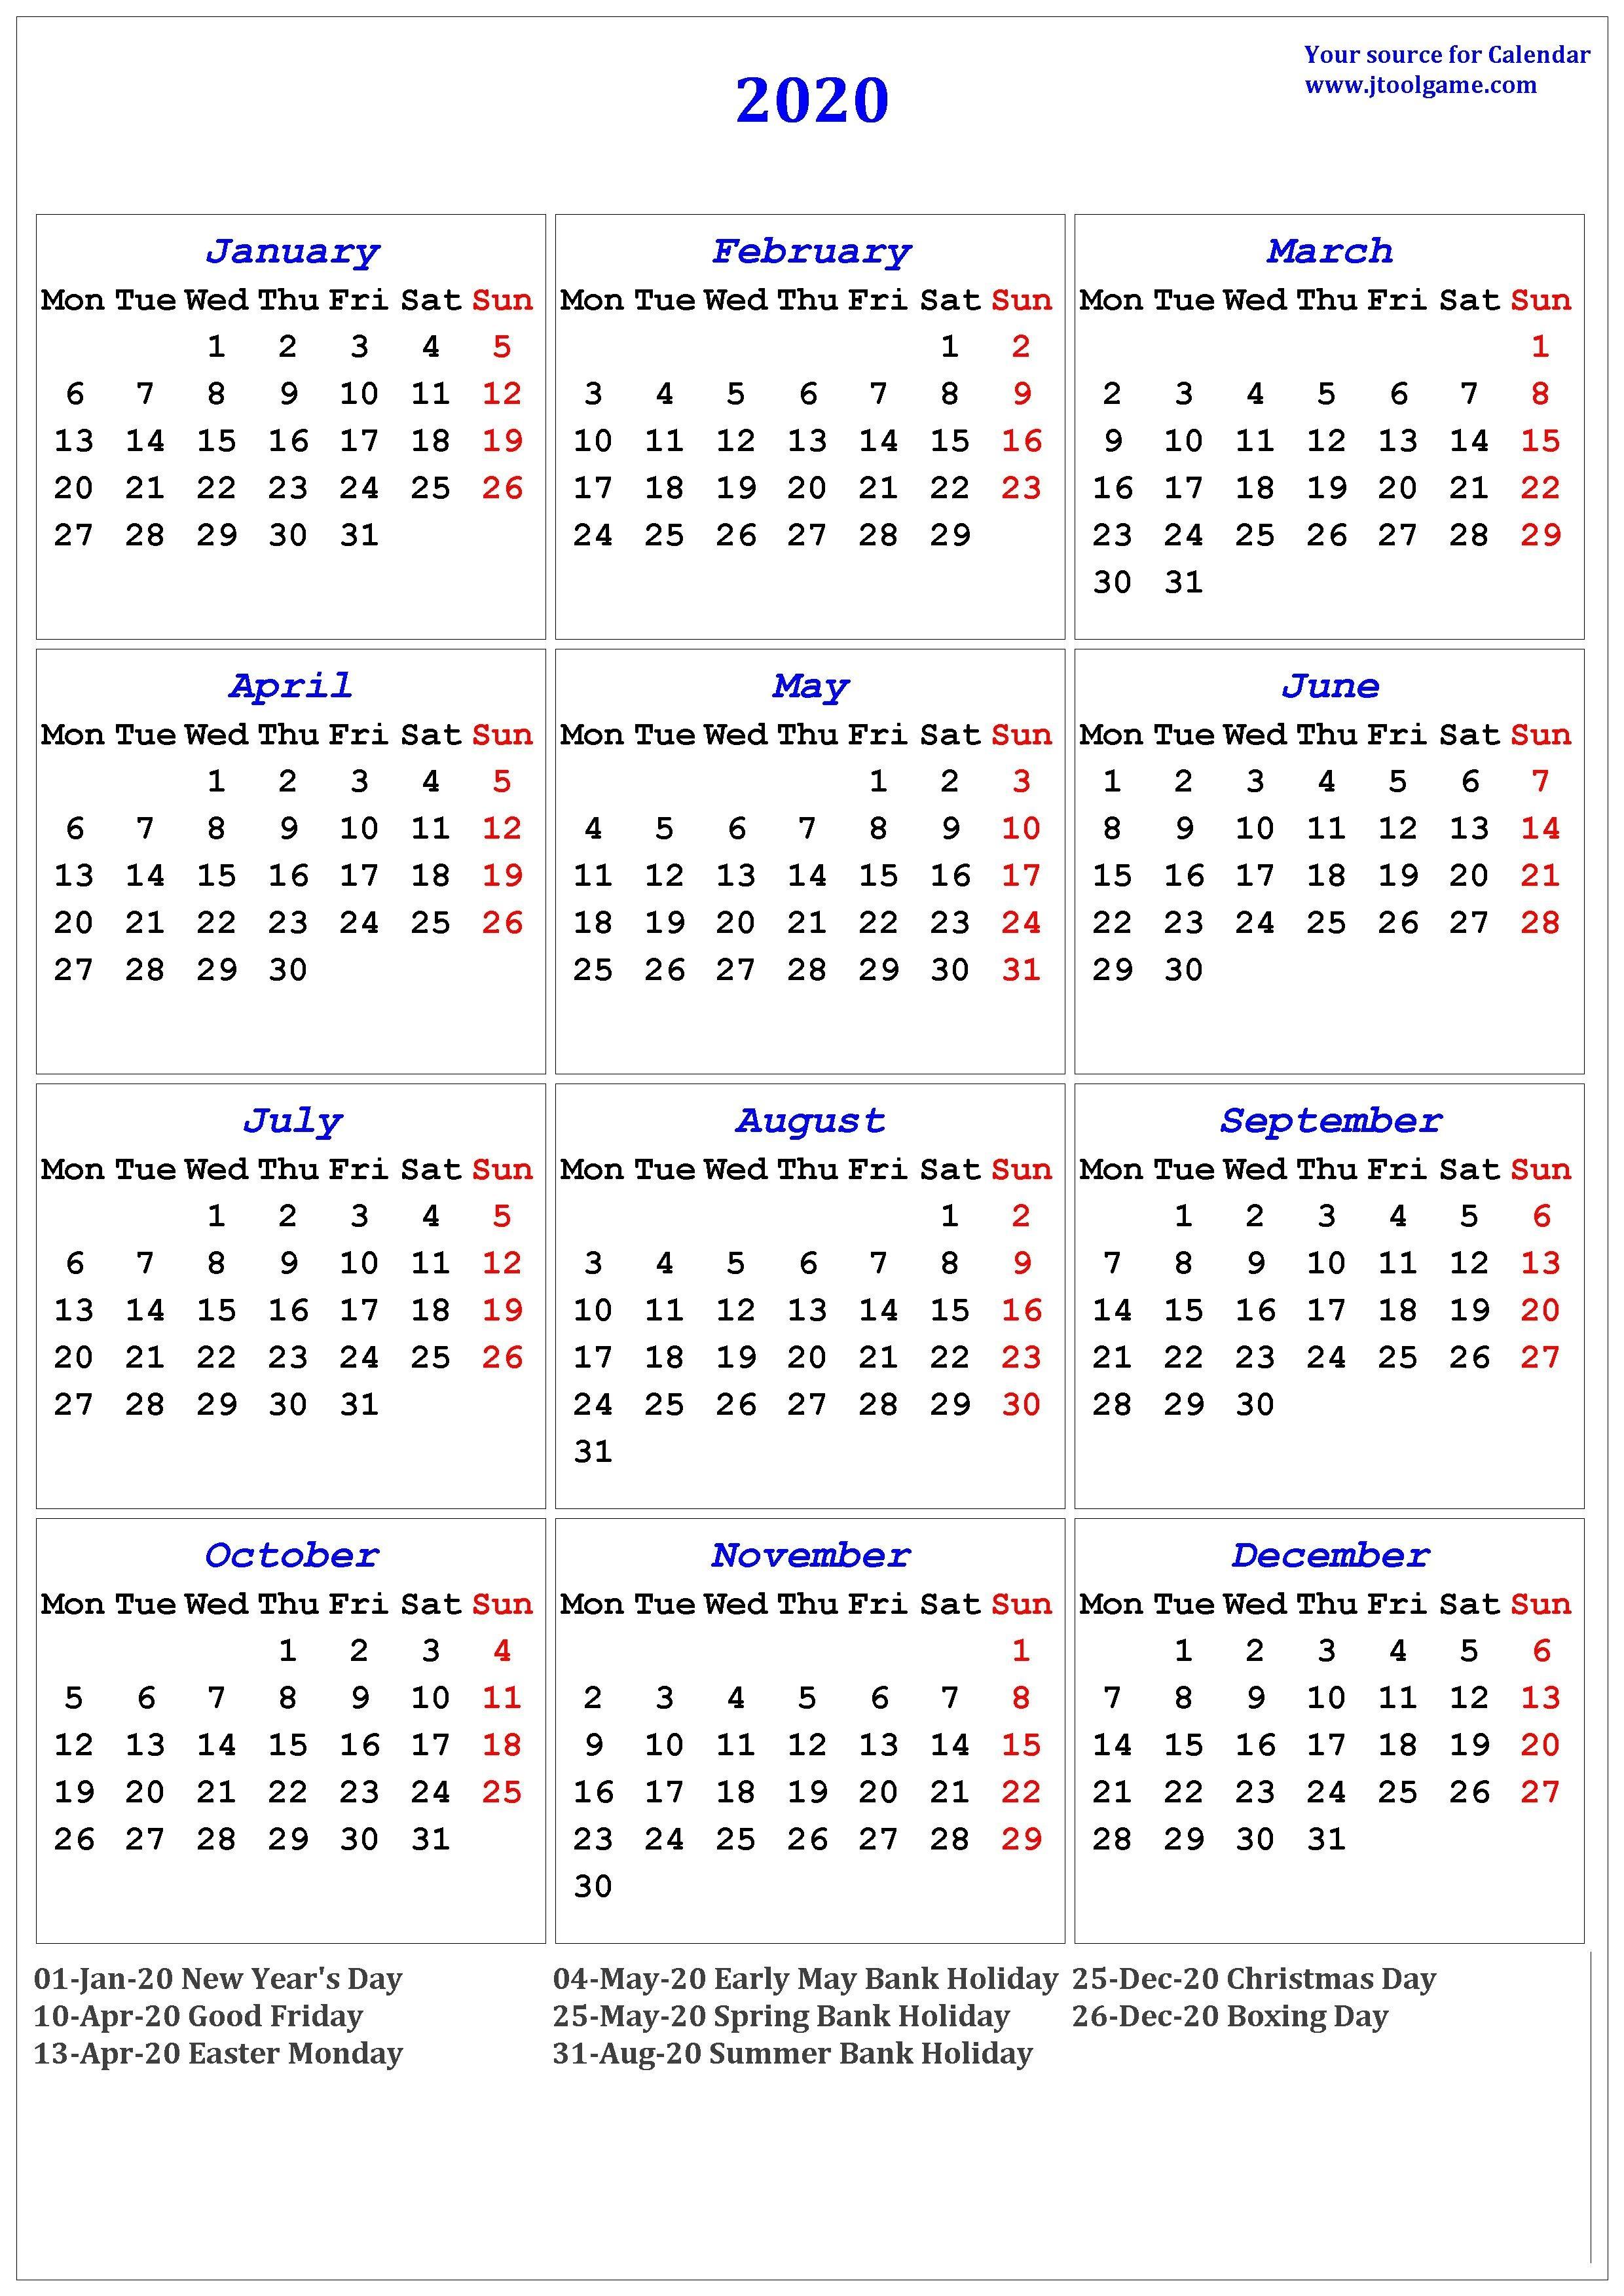 Bank Holidays Uk 2020-2020 Calendar Including Bank Holidays